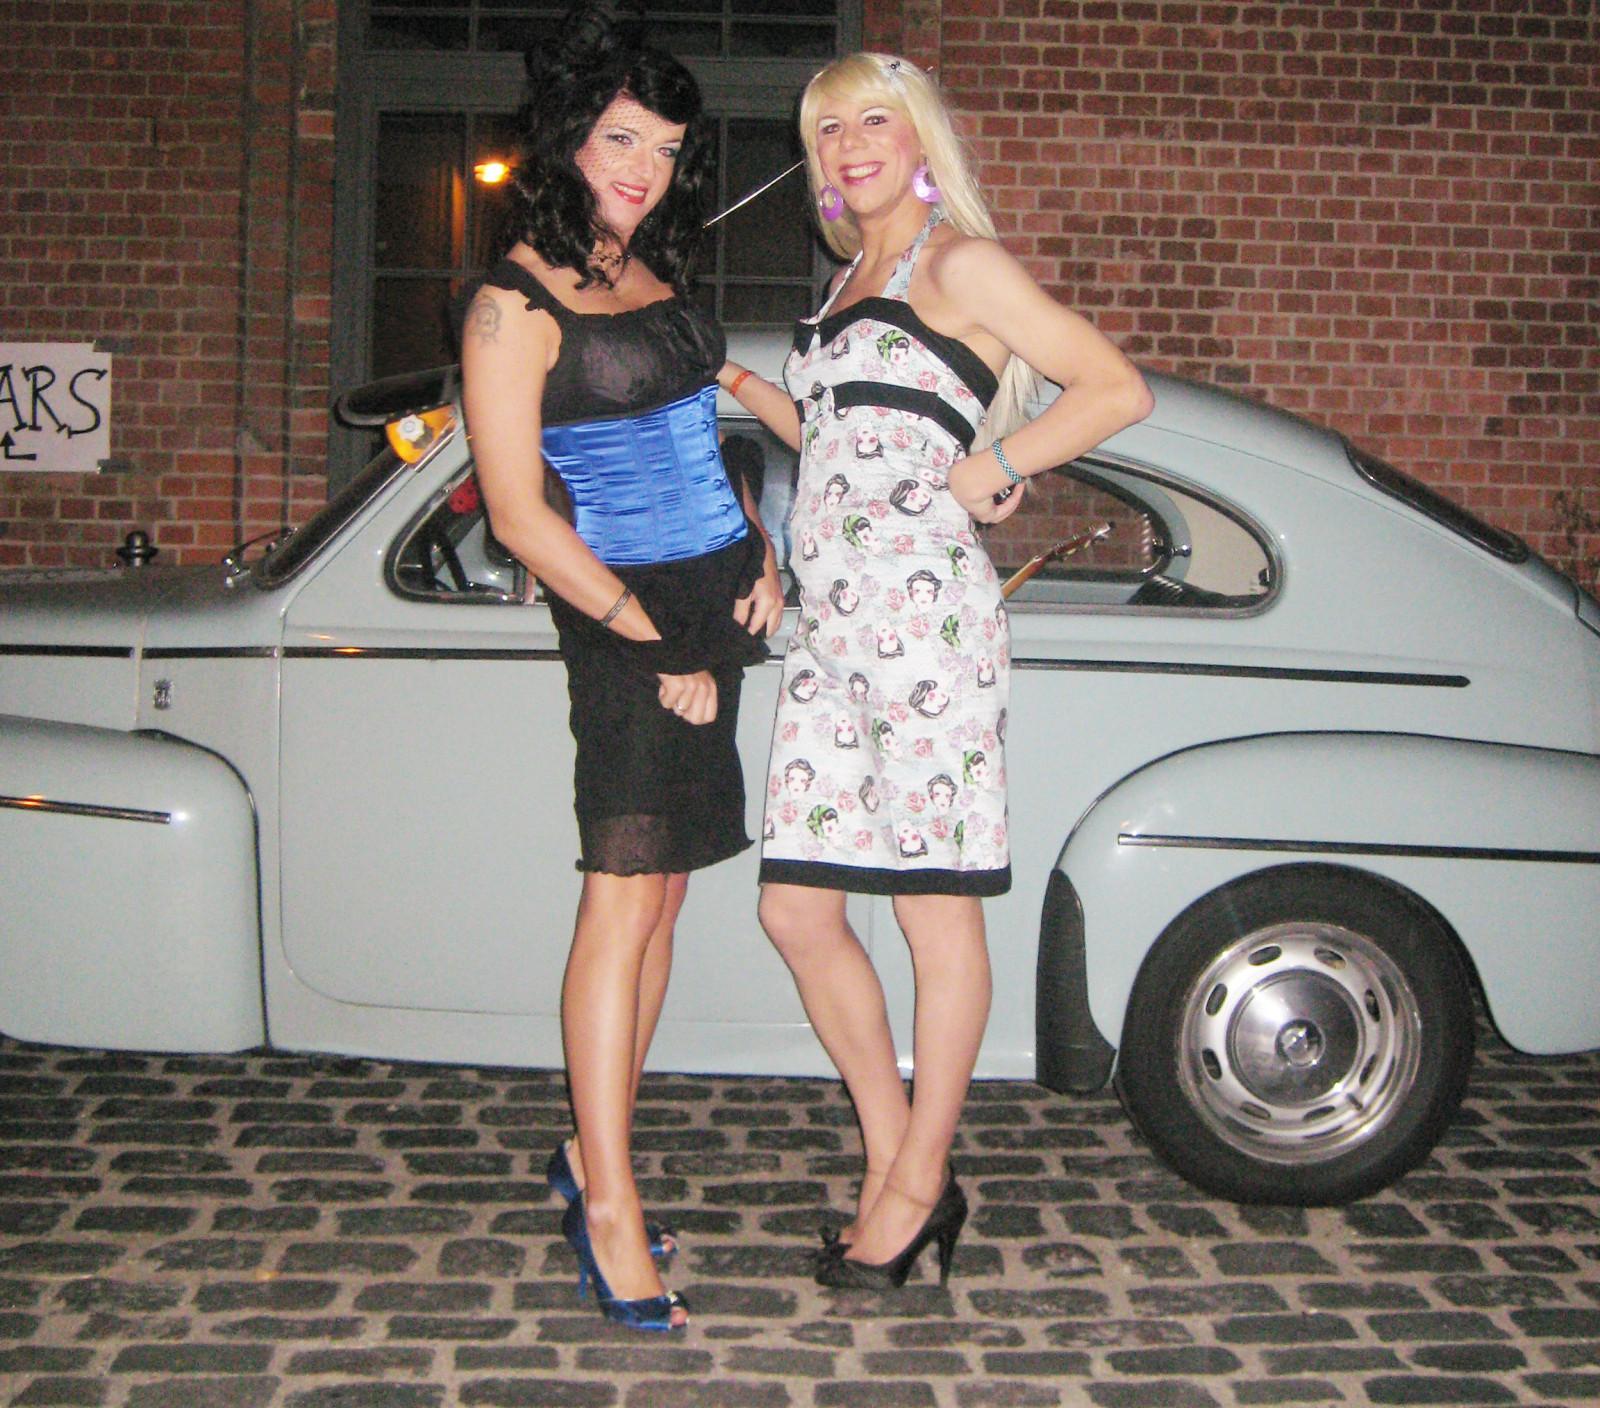 50s Classic Cars Wallpaper Wallpaper Girls Cars Fashion Zoe Volvo 60s